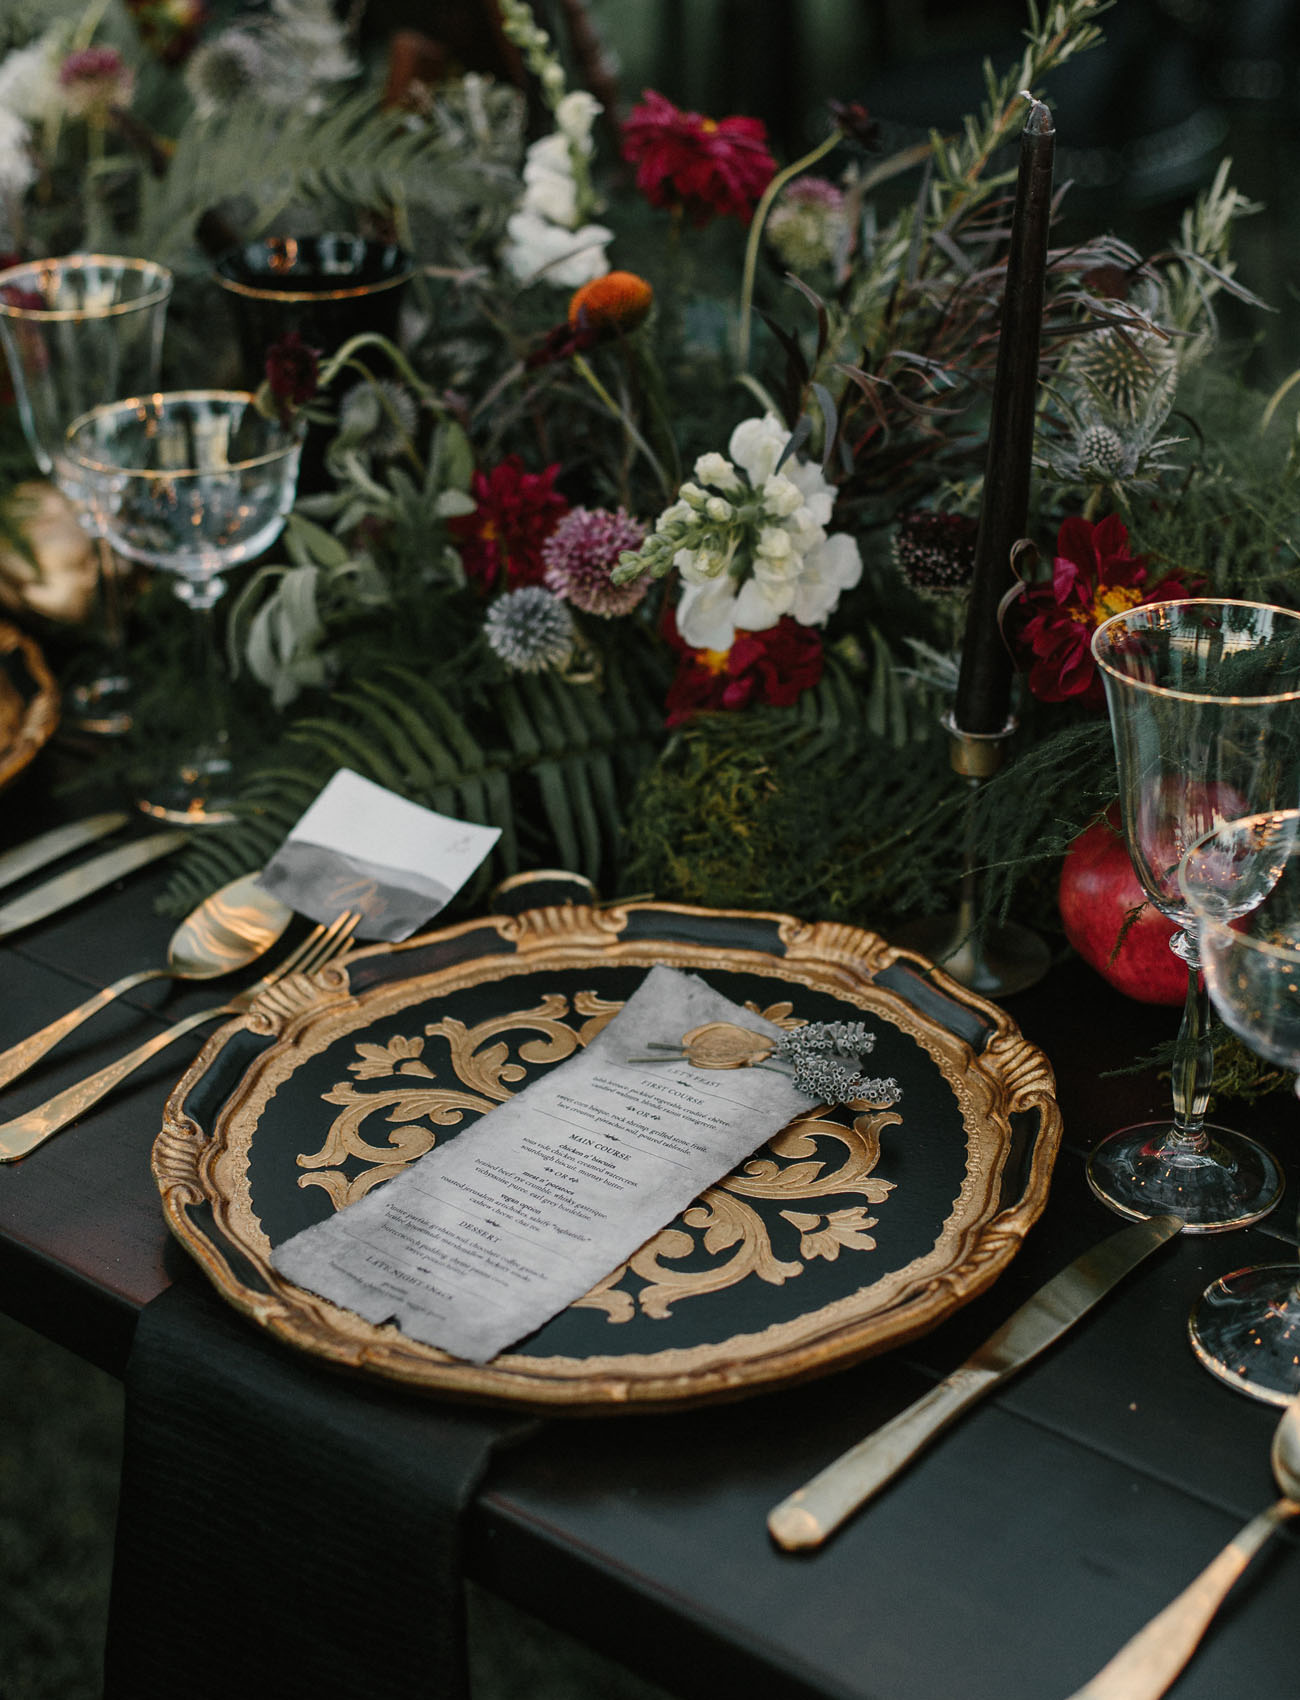 ornate plate setting